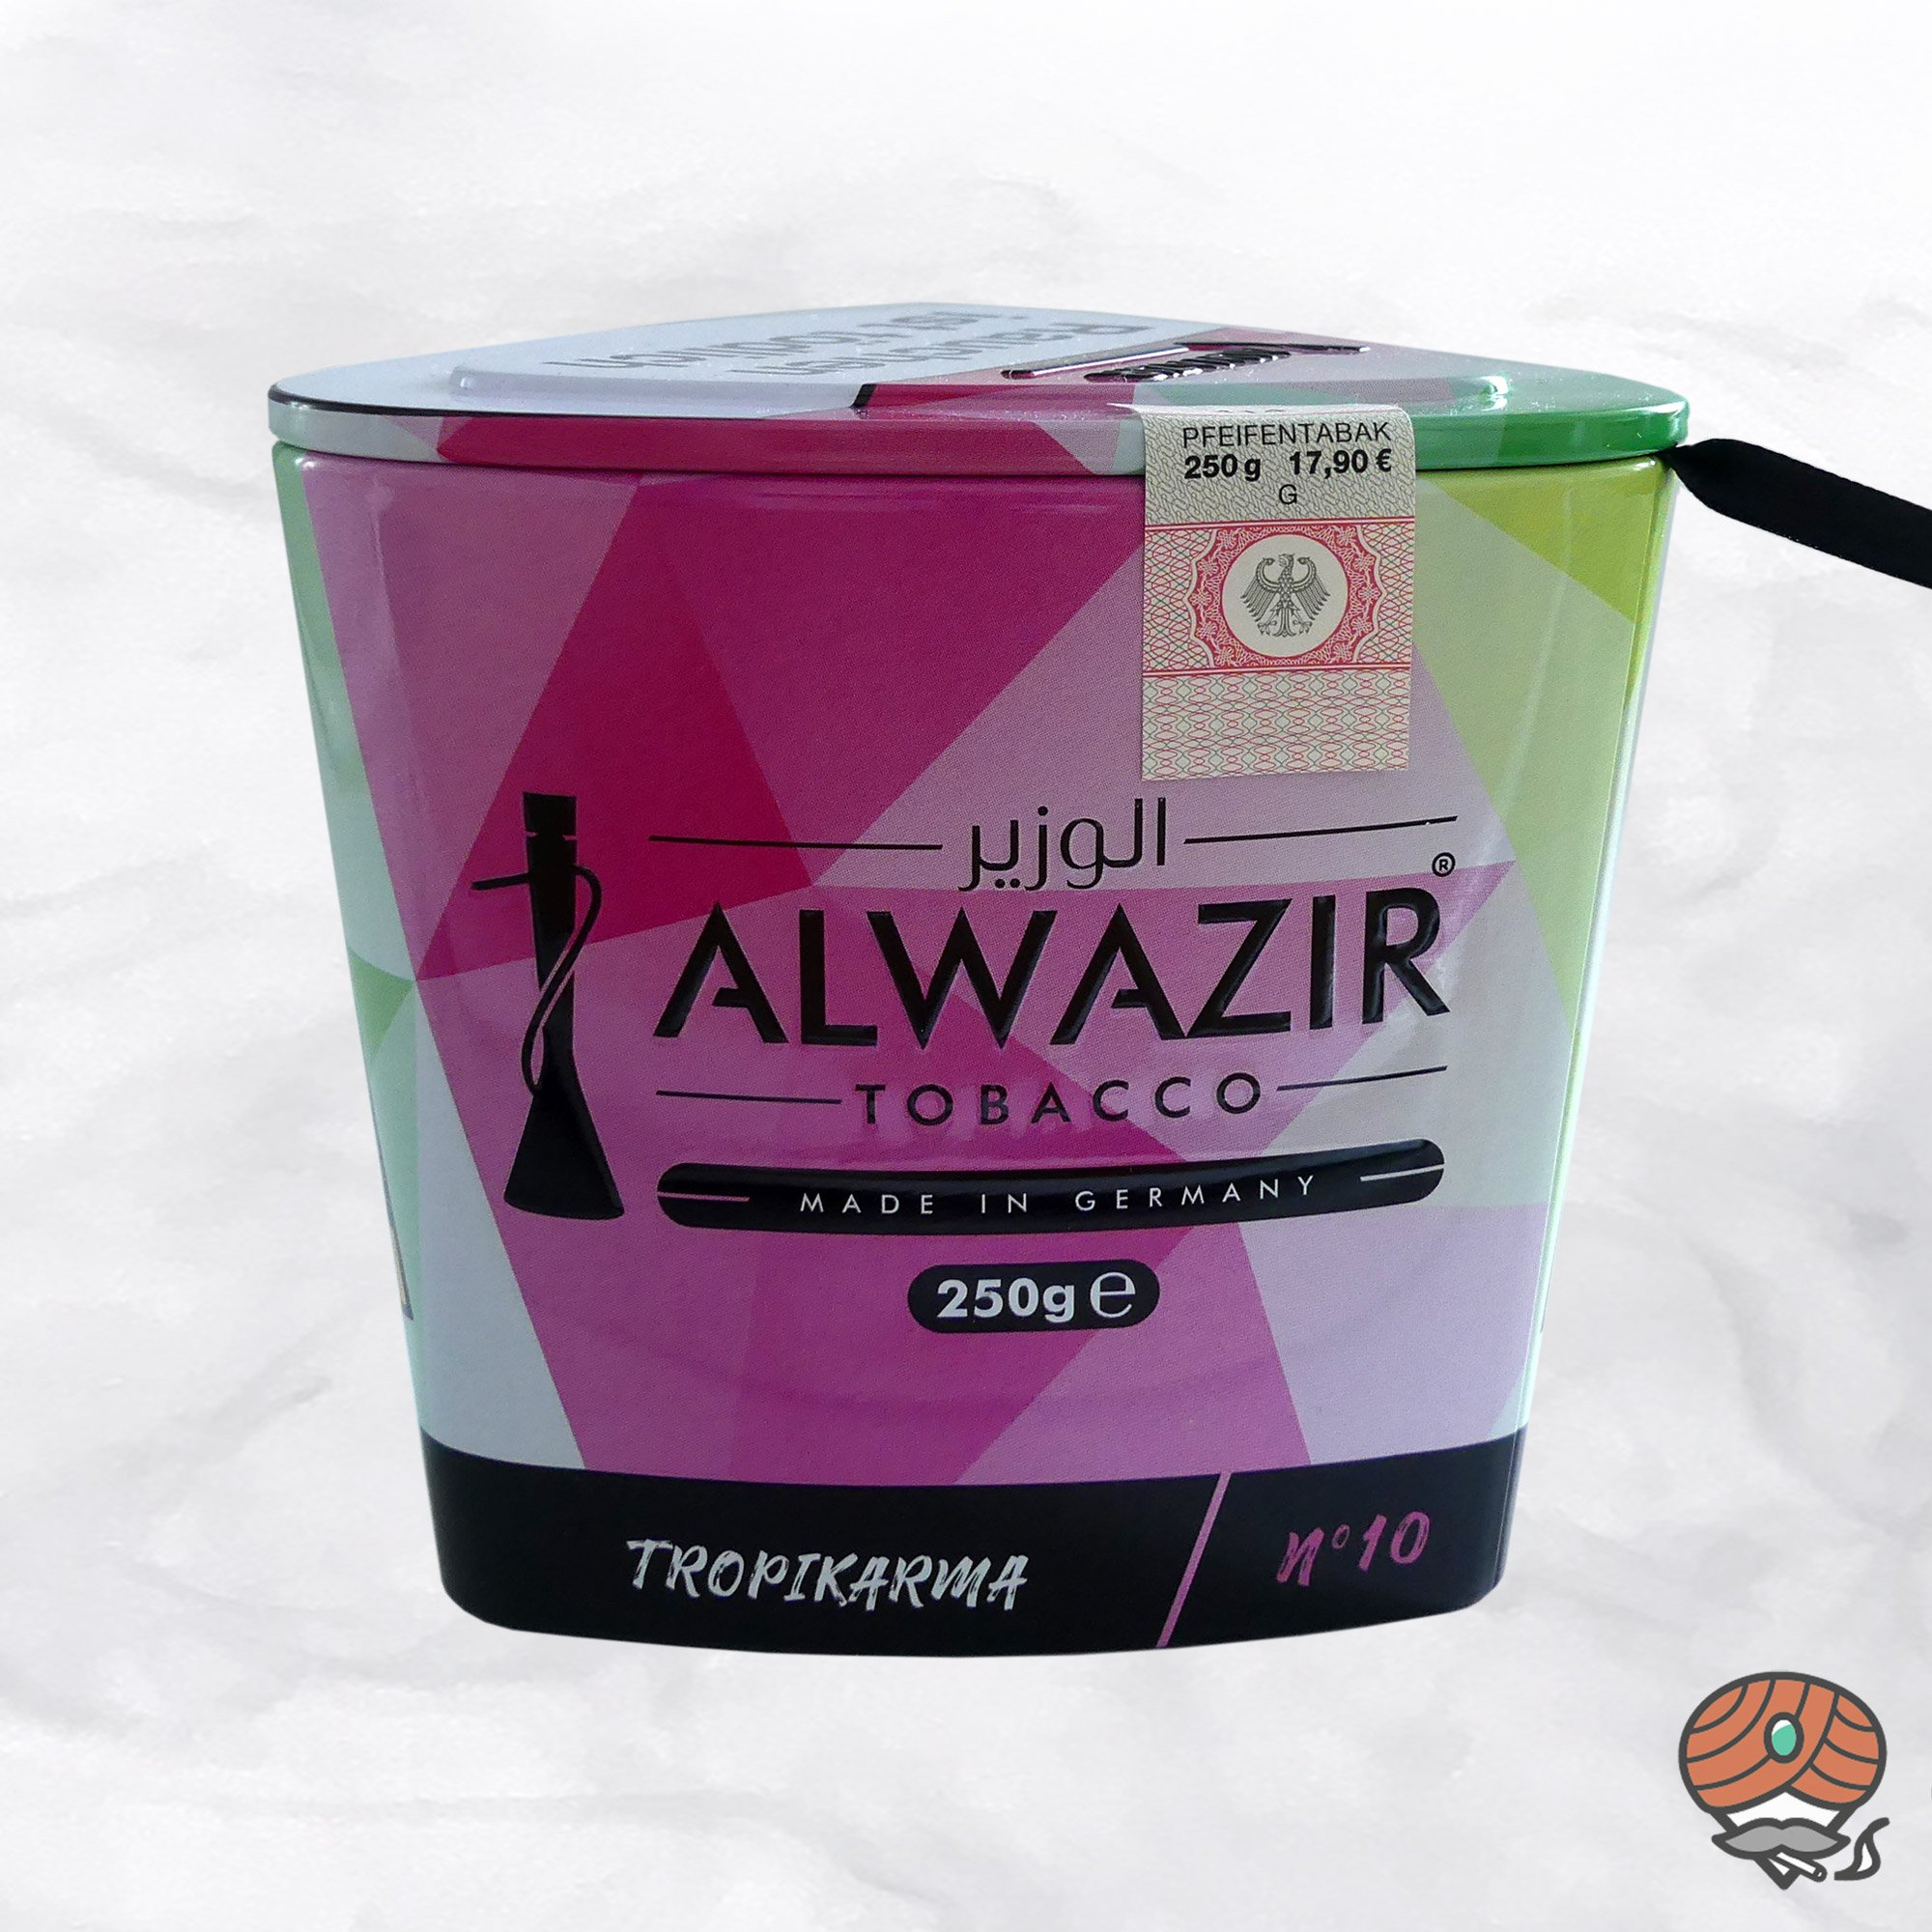 Alwazir Shisha Tabak - No. 10 - TROPIKARMA 250g